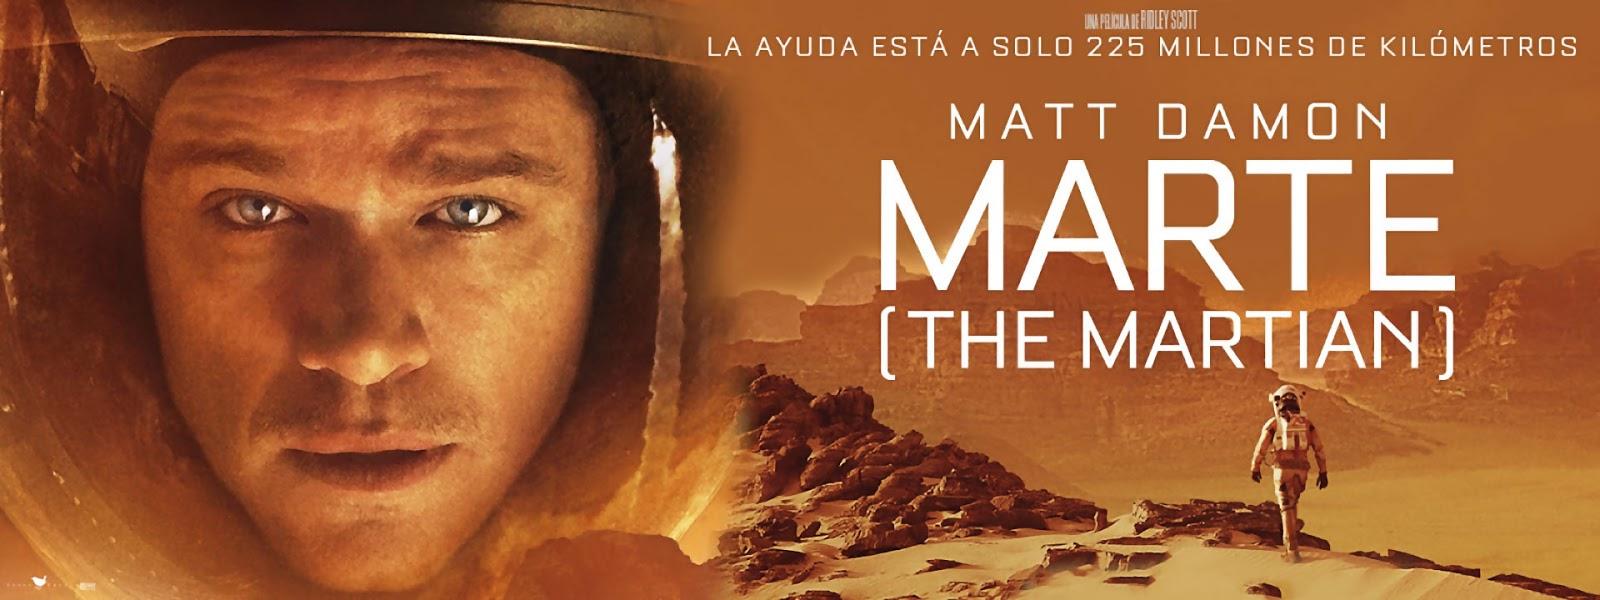 Marte - The Martian